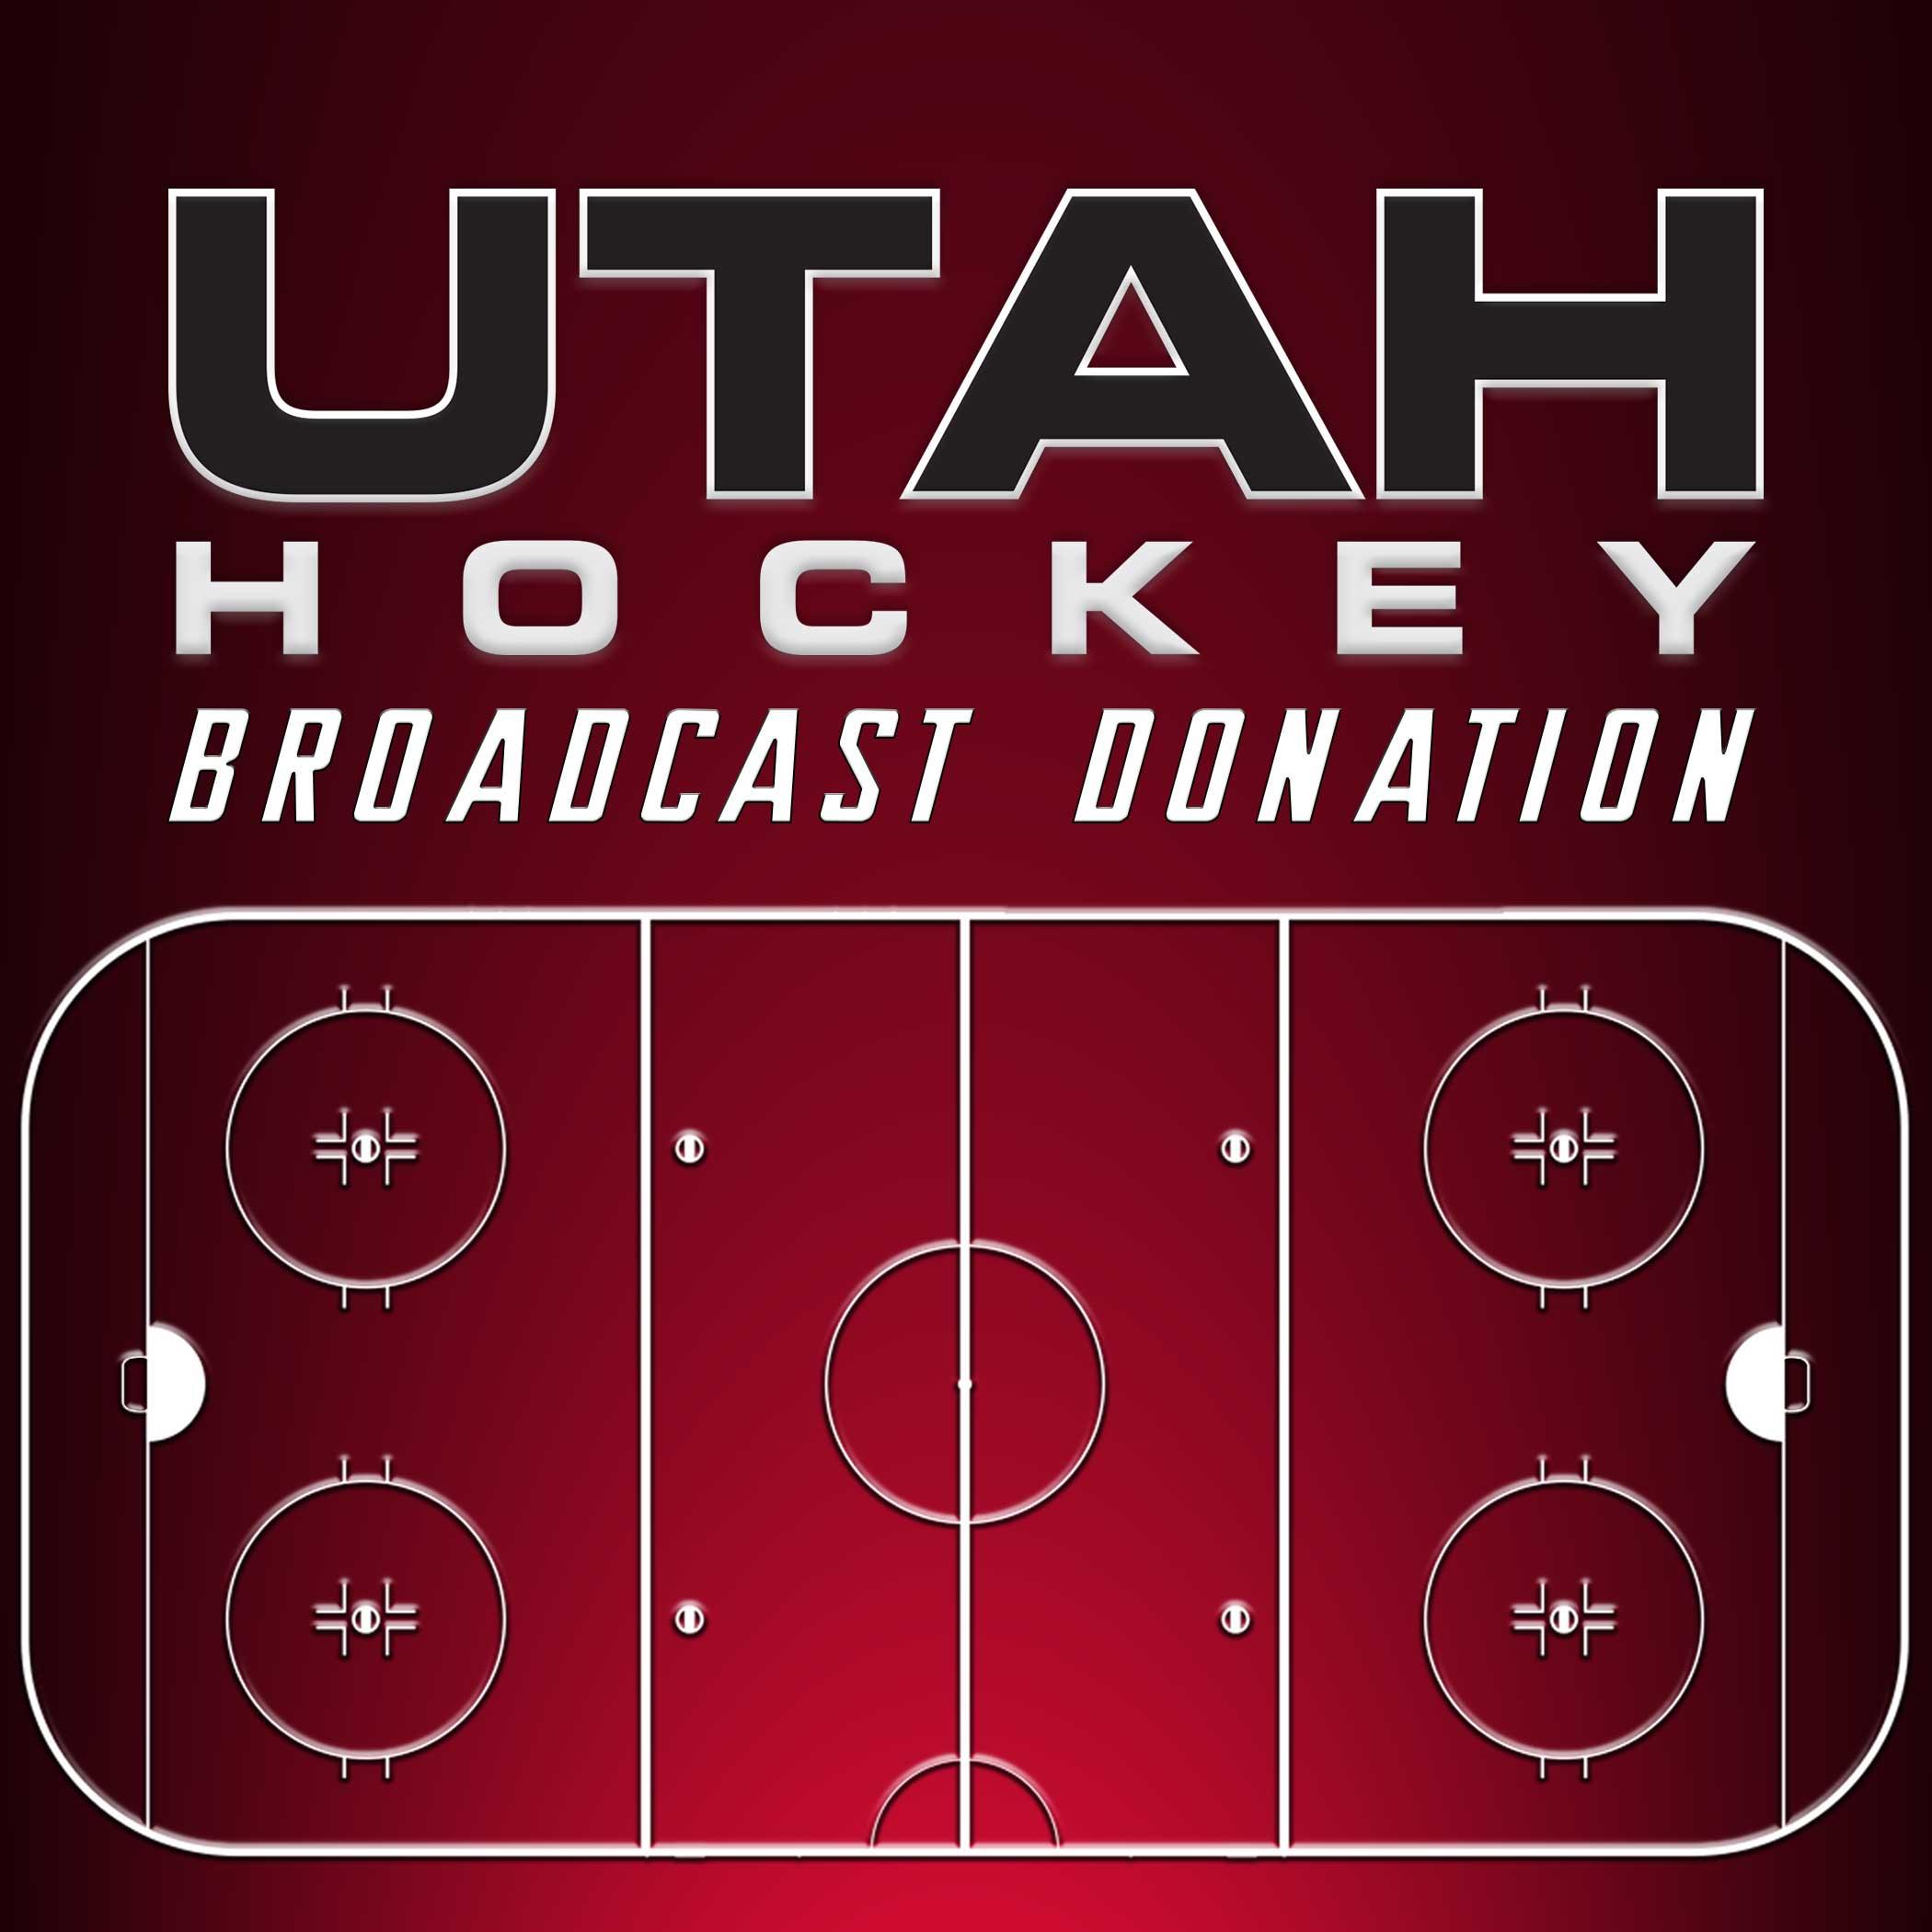 2021 Utah Hockey Broadcast Donation